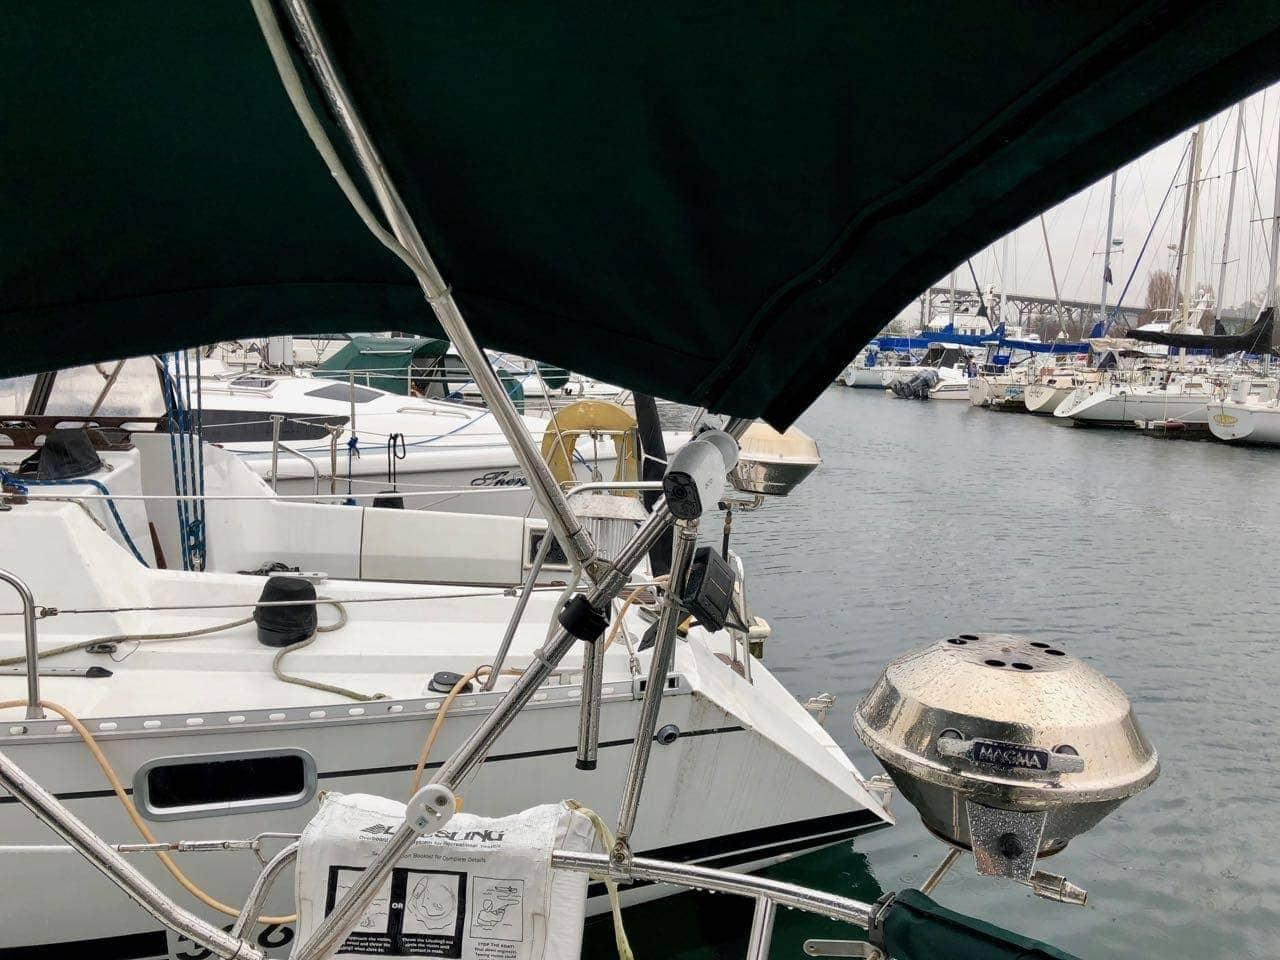 Arlo-on-sailboat-camera-cockpit-area